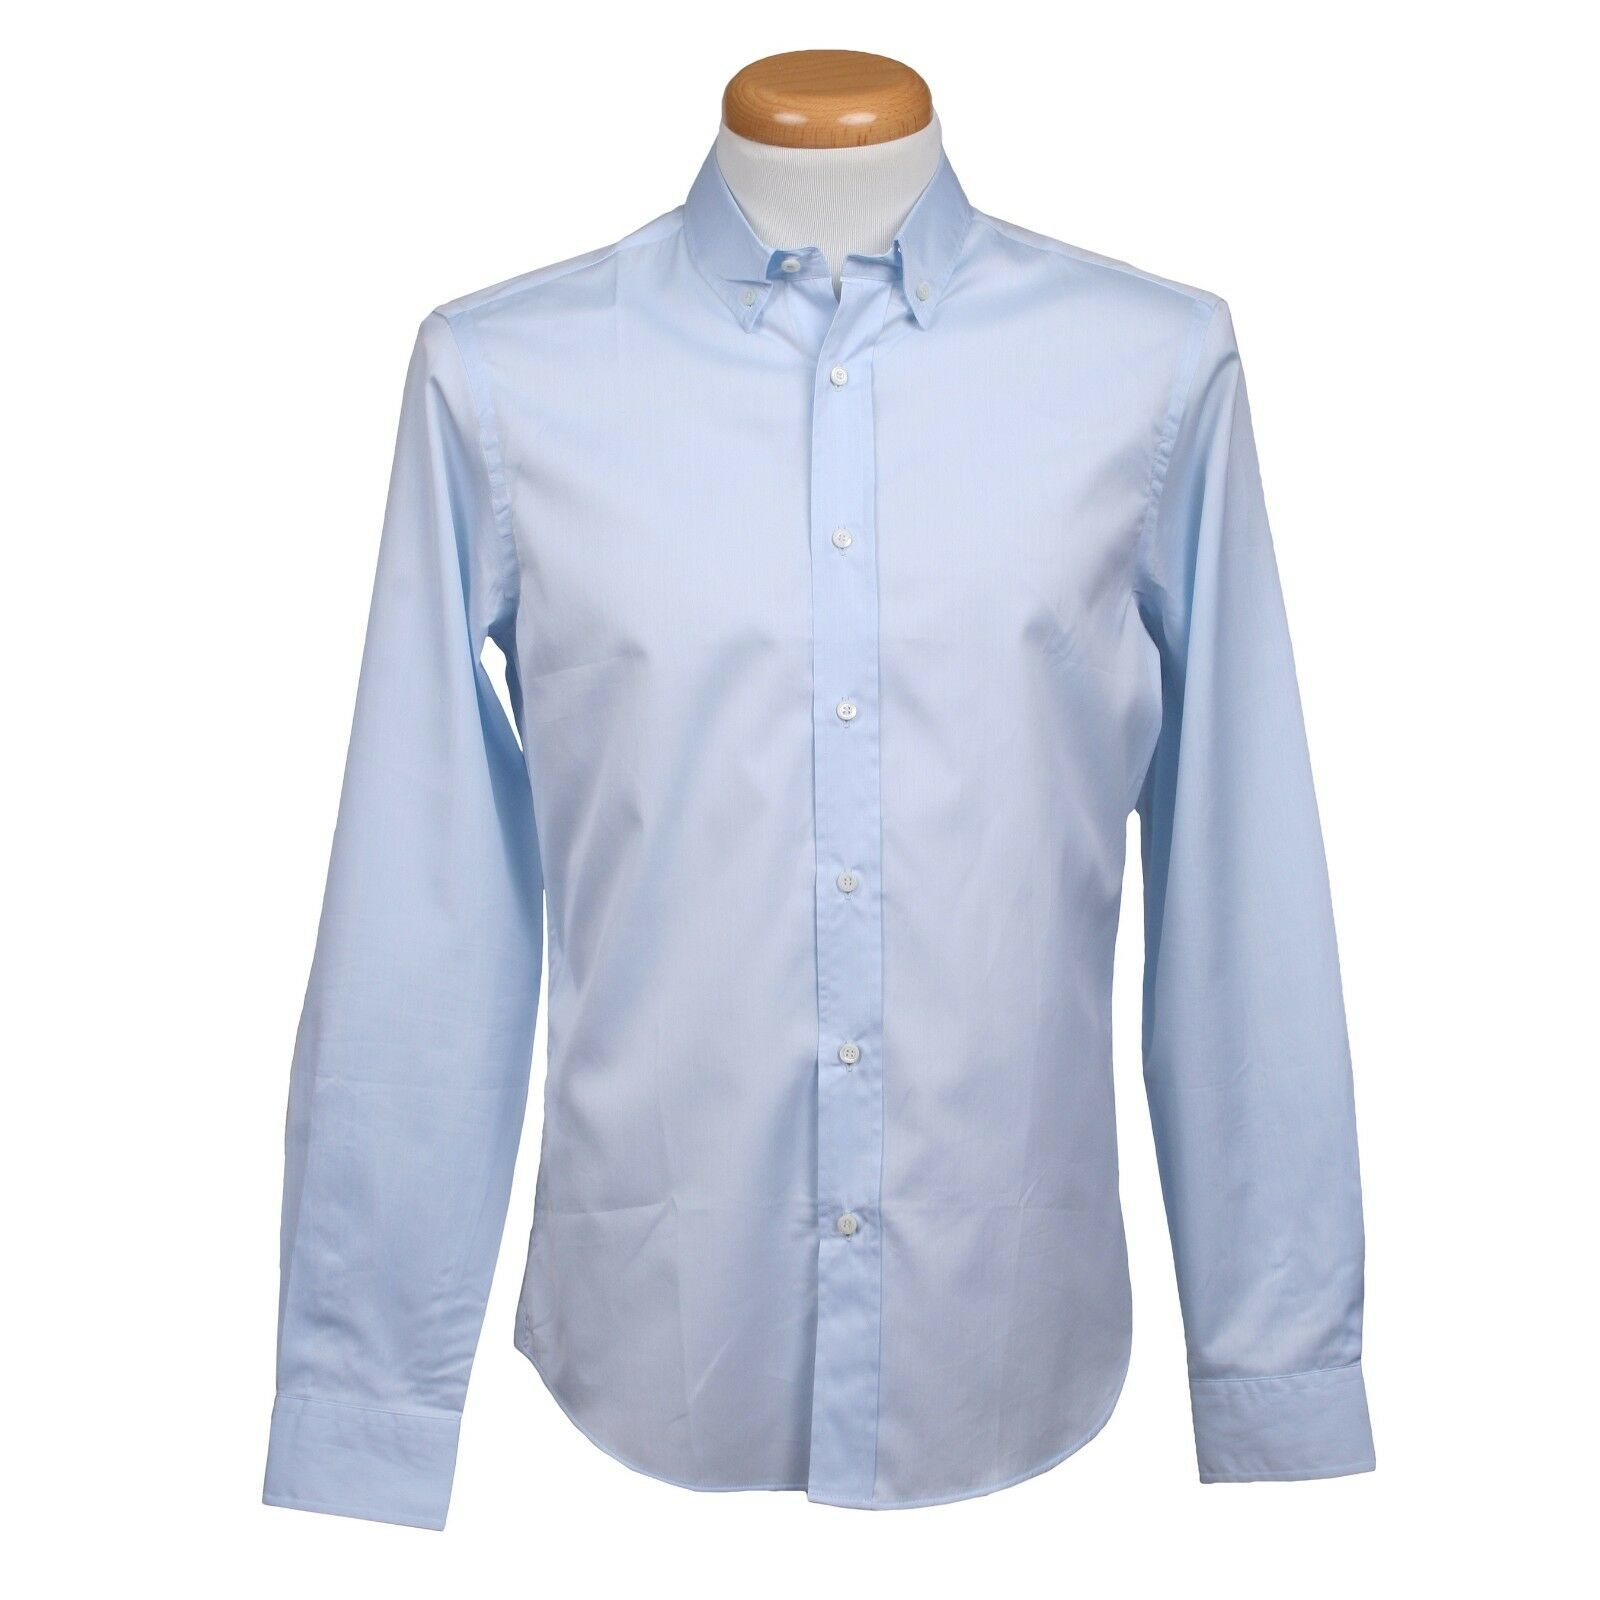 Brunello Cucinelli 100% Cotton Long Sleeve bluee Dress Shirt SIZE M NEW S60